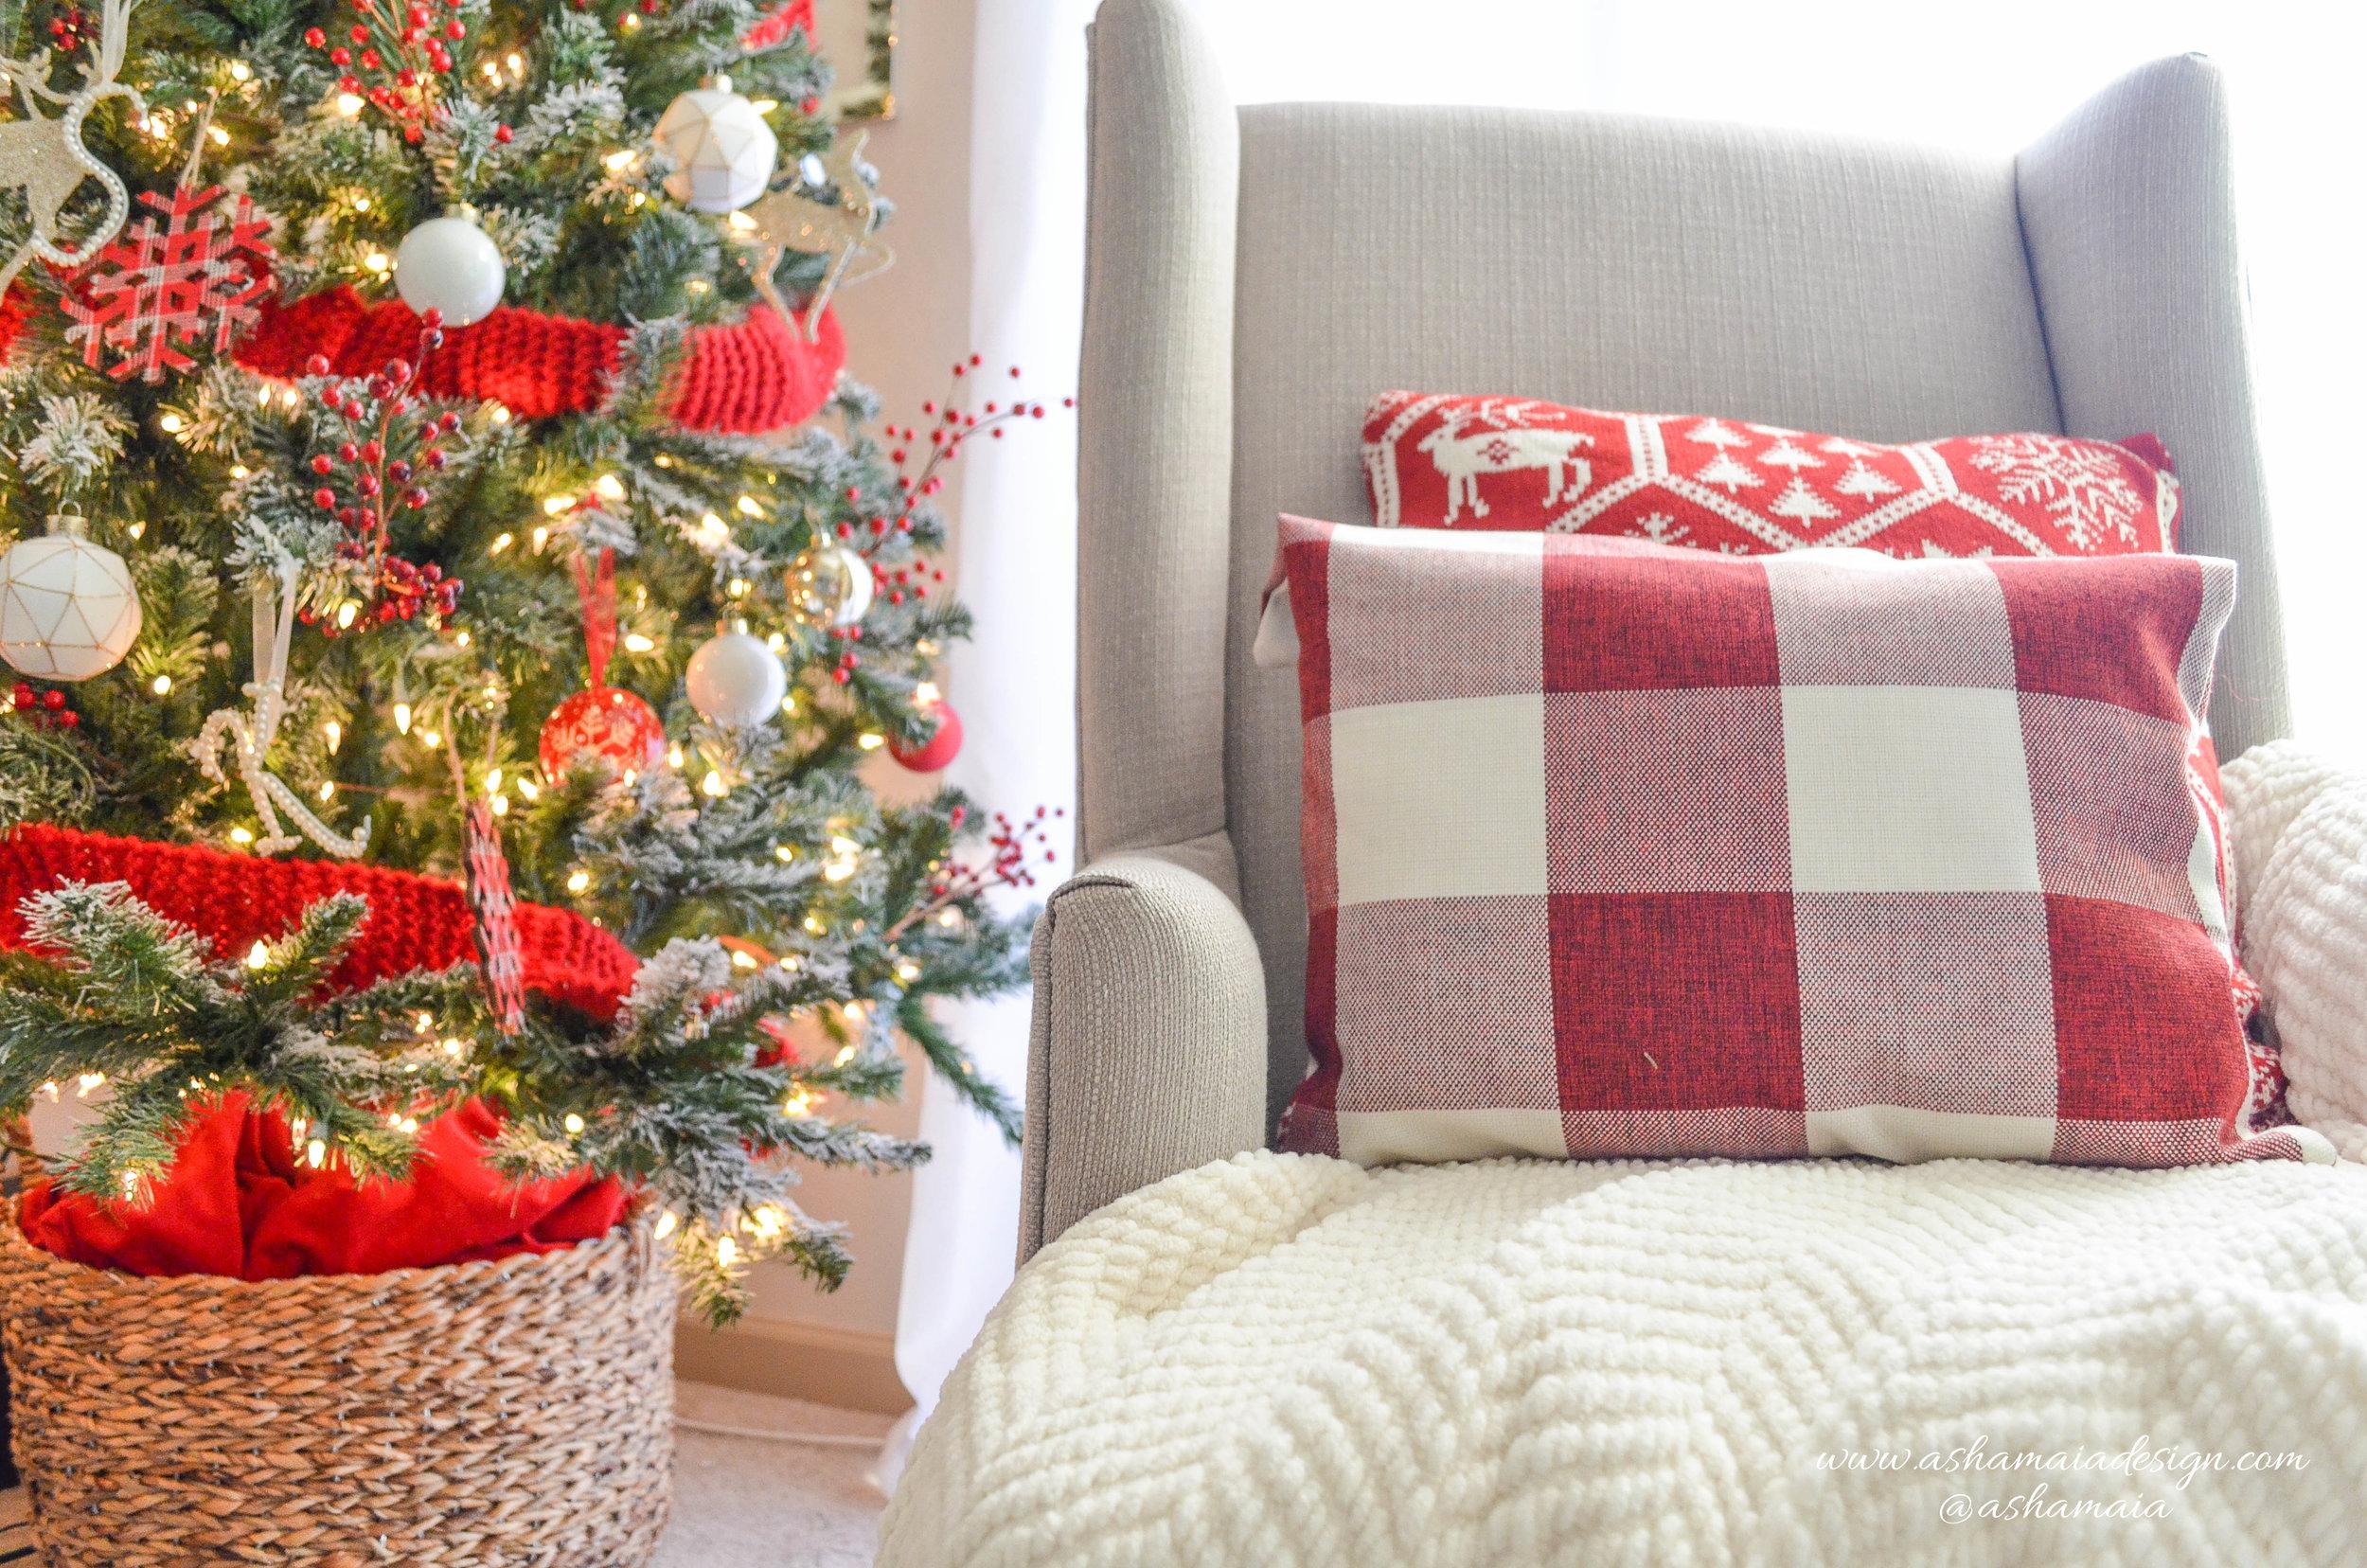 Cozy Christmas Decor-56.jpg